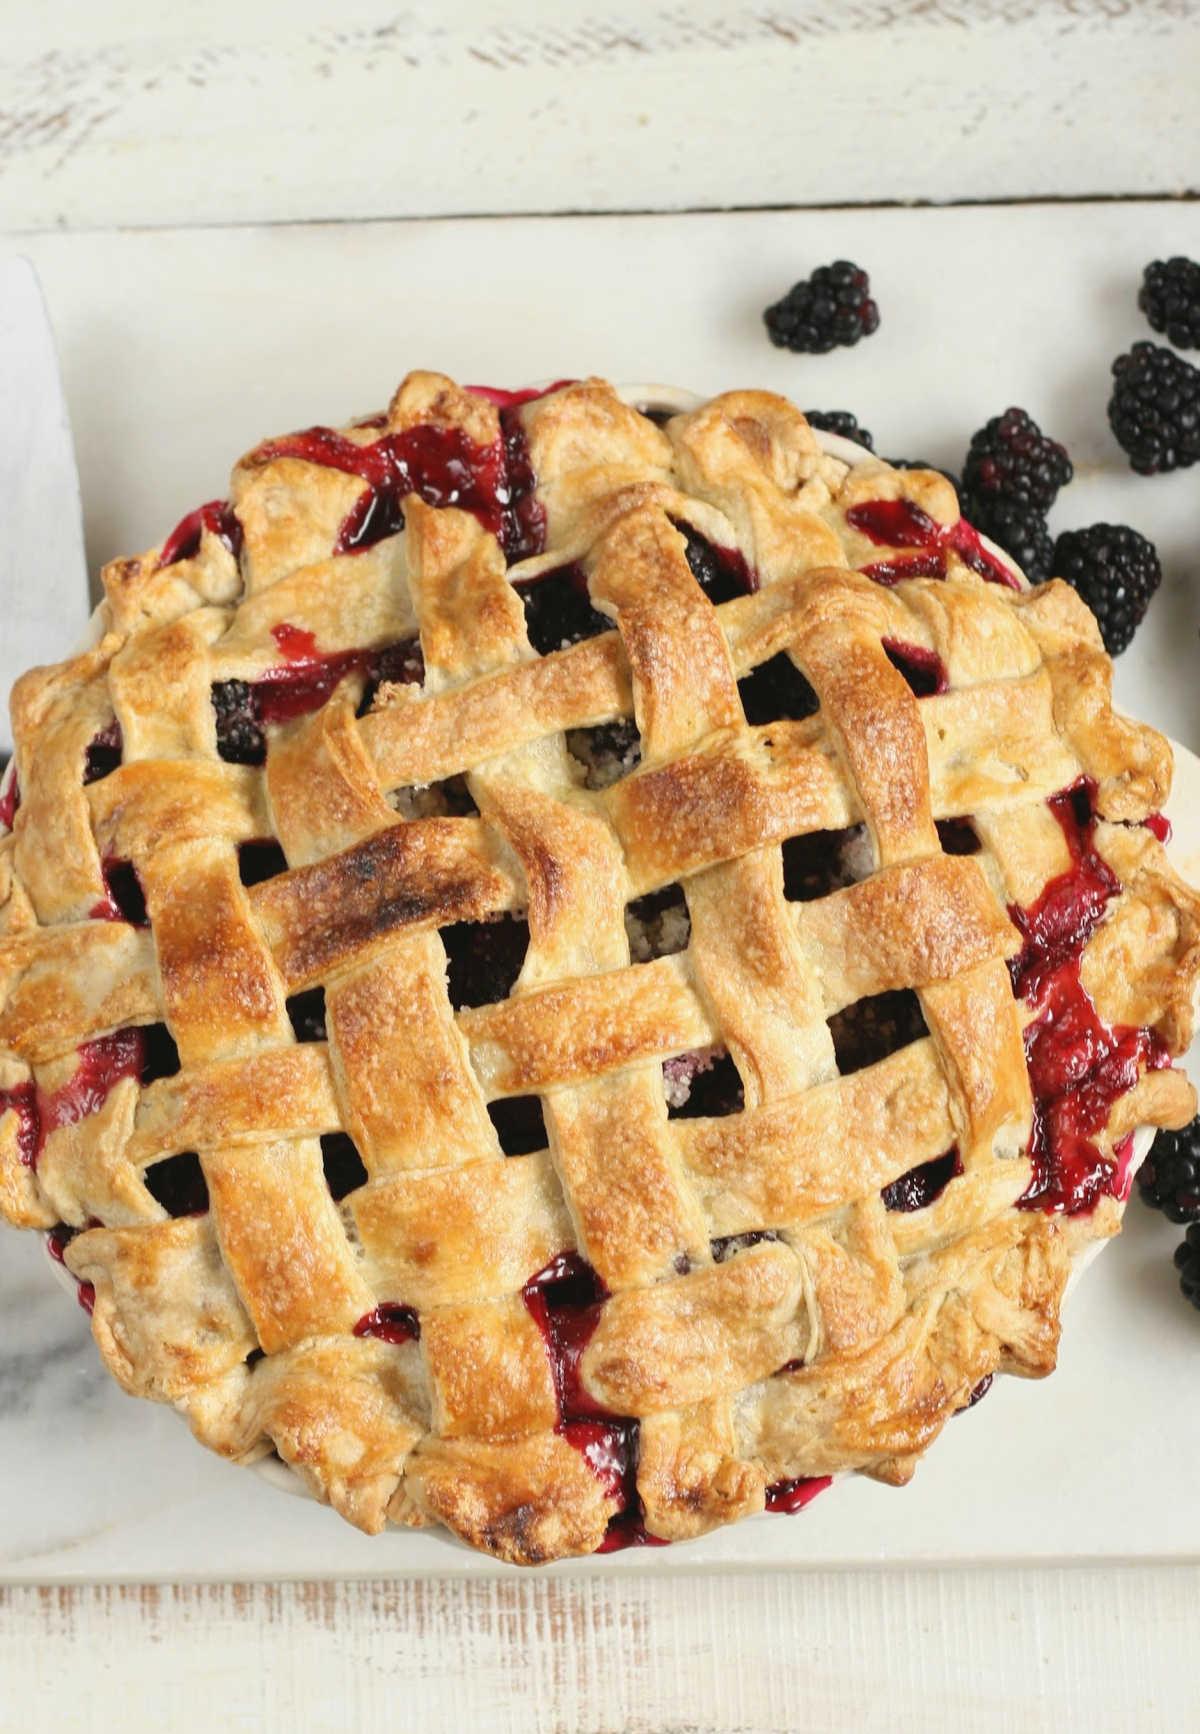 blackberry pie with lattice crust, fresh blackberries around it.